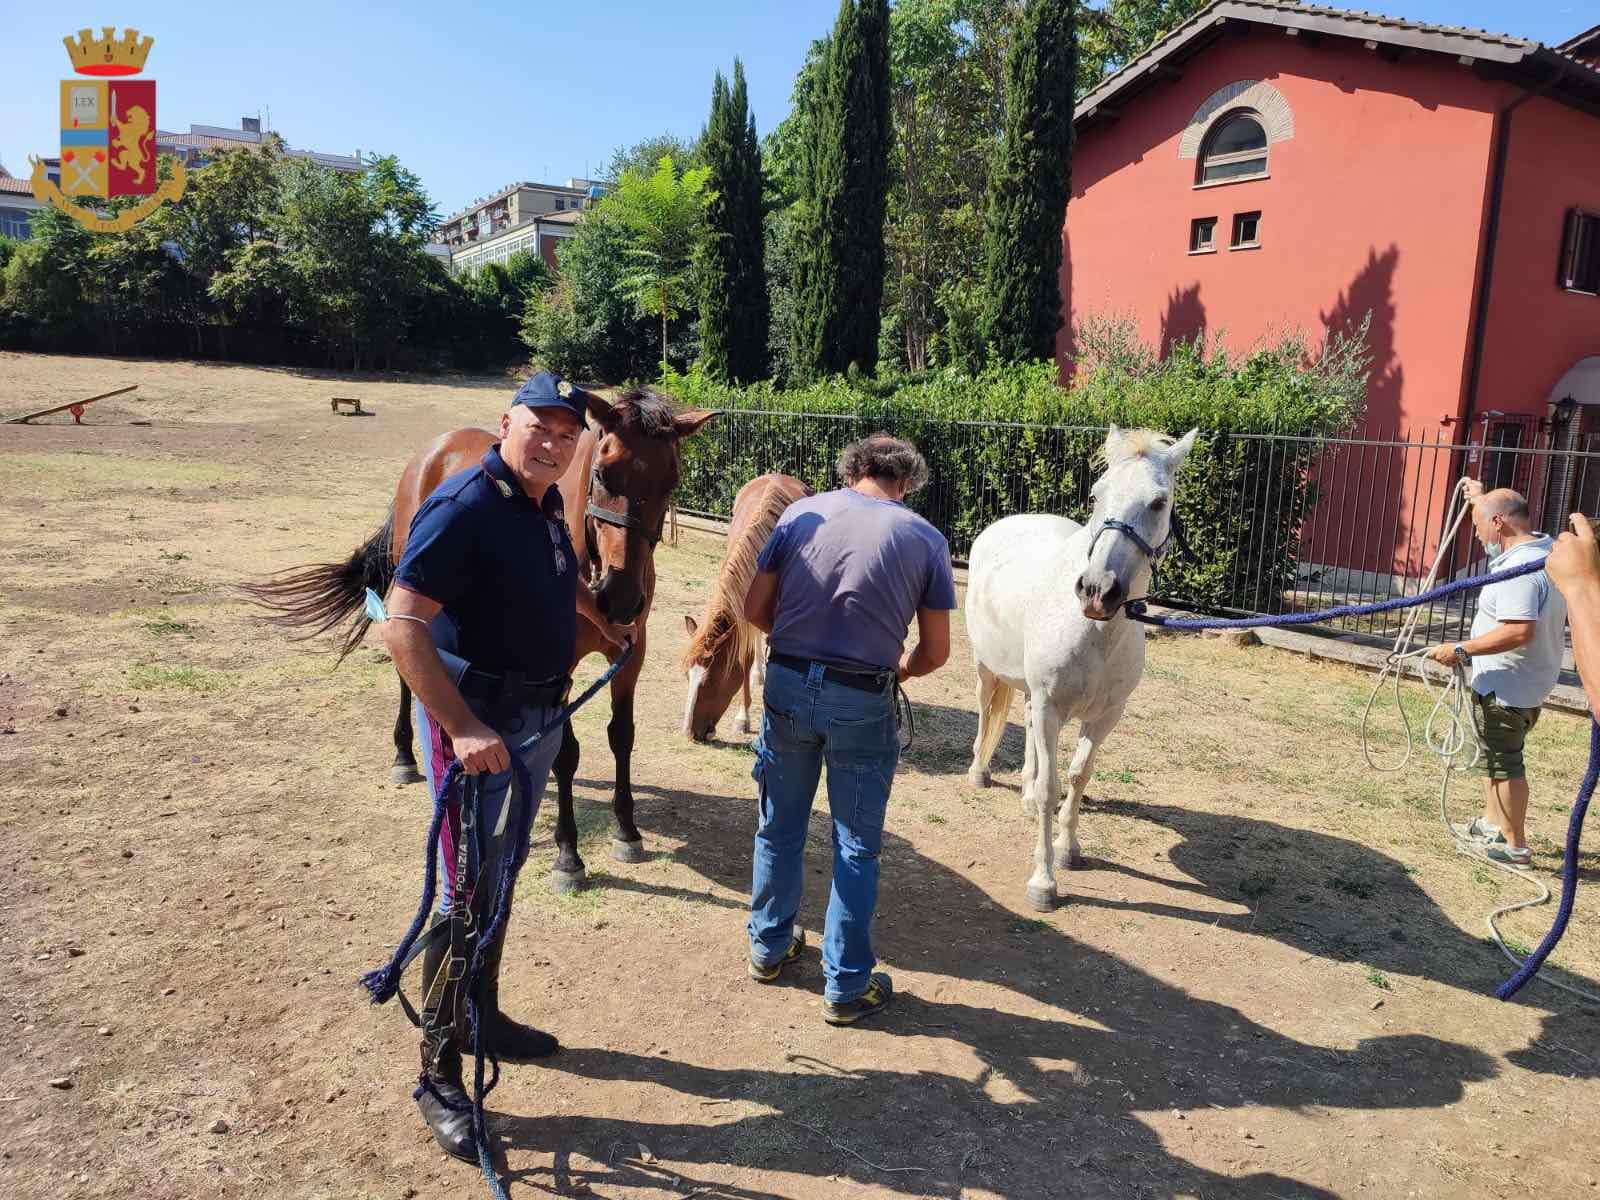 cavalli in strada roma